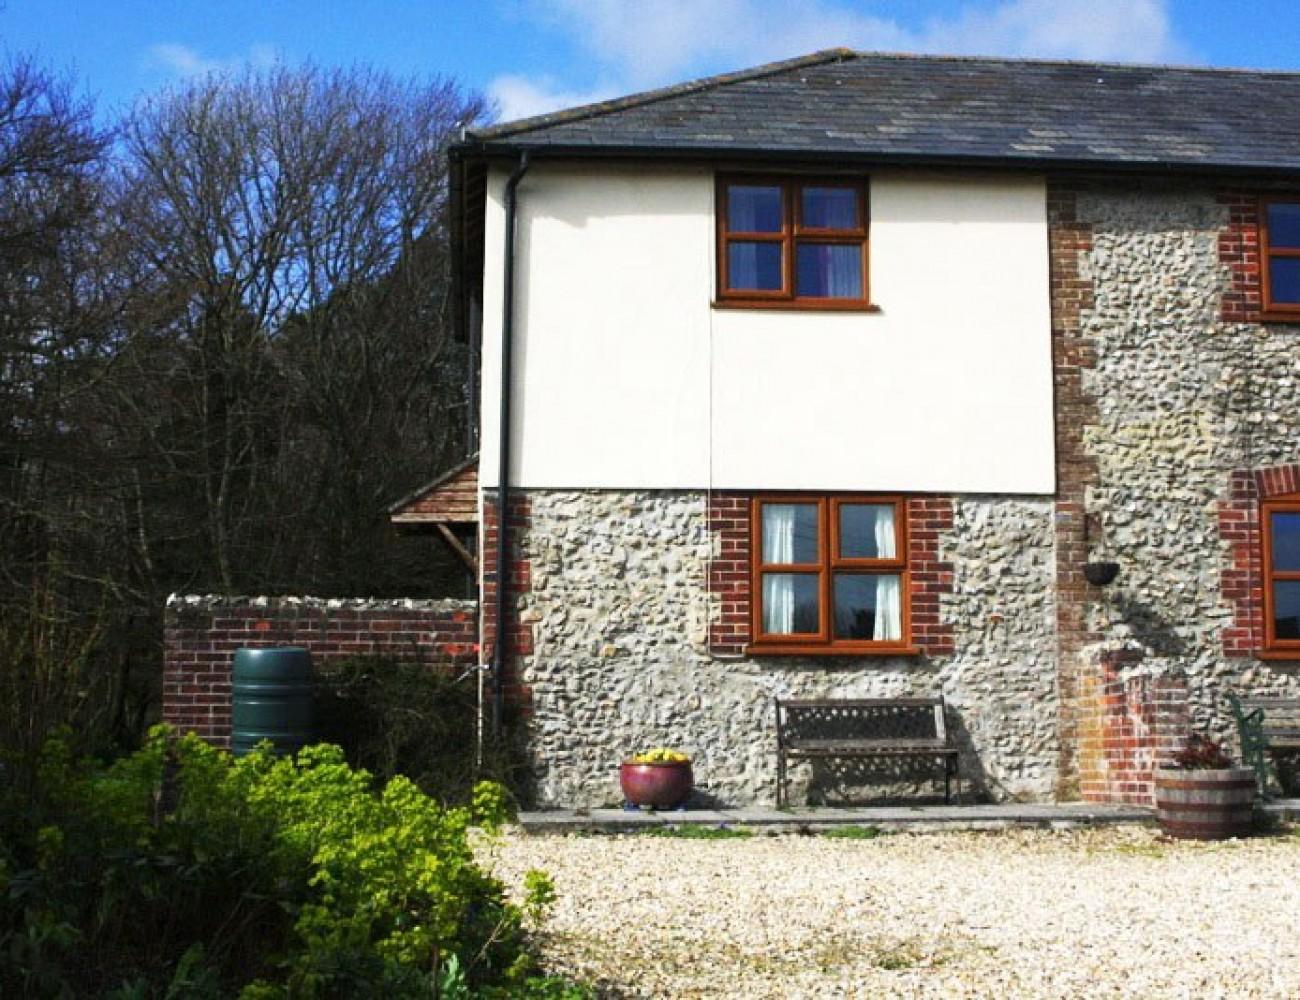 Bride cottage at lancombe country cottages unique for Unique holiday cottages